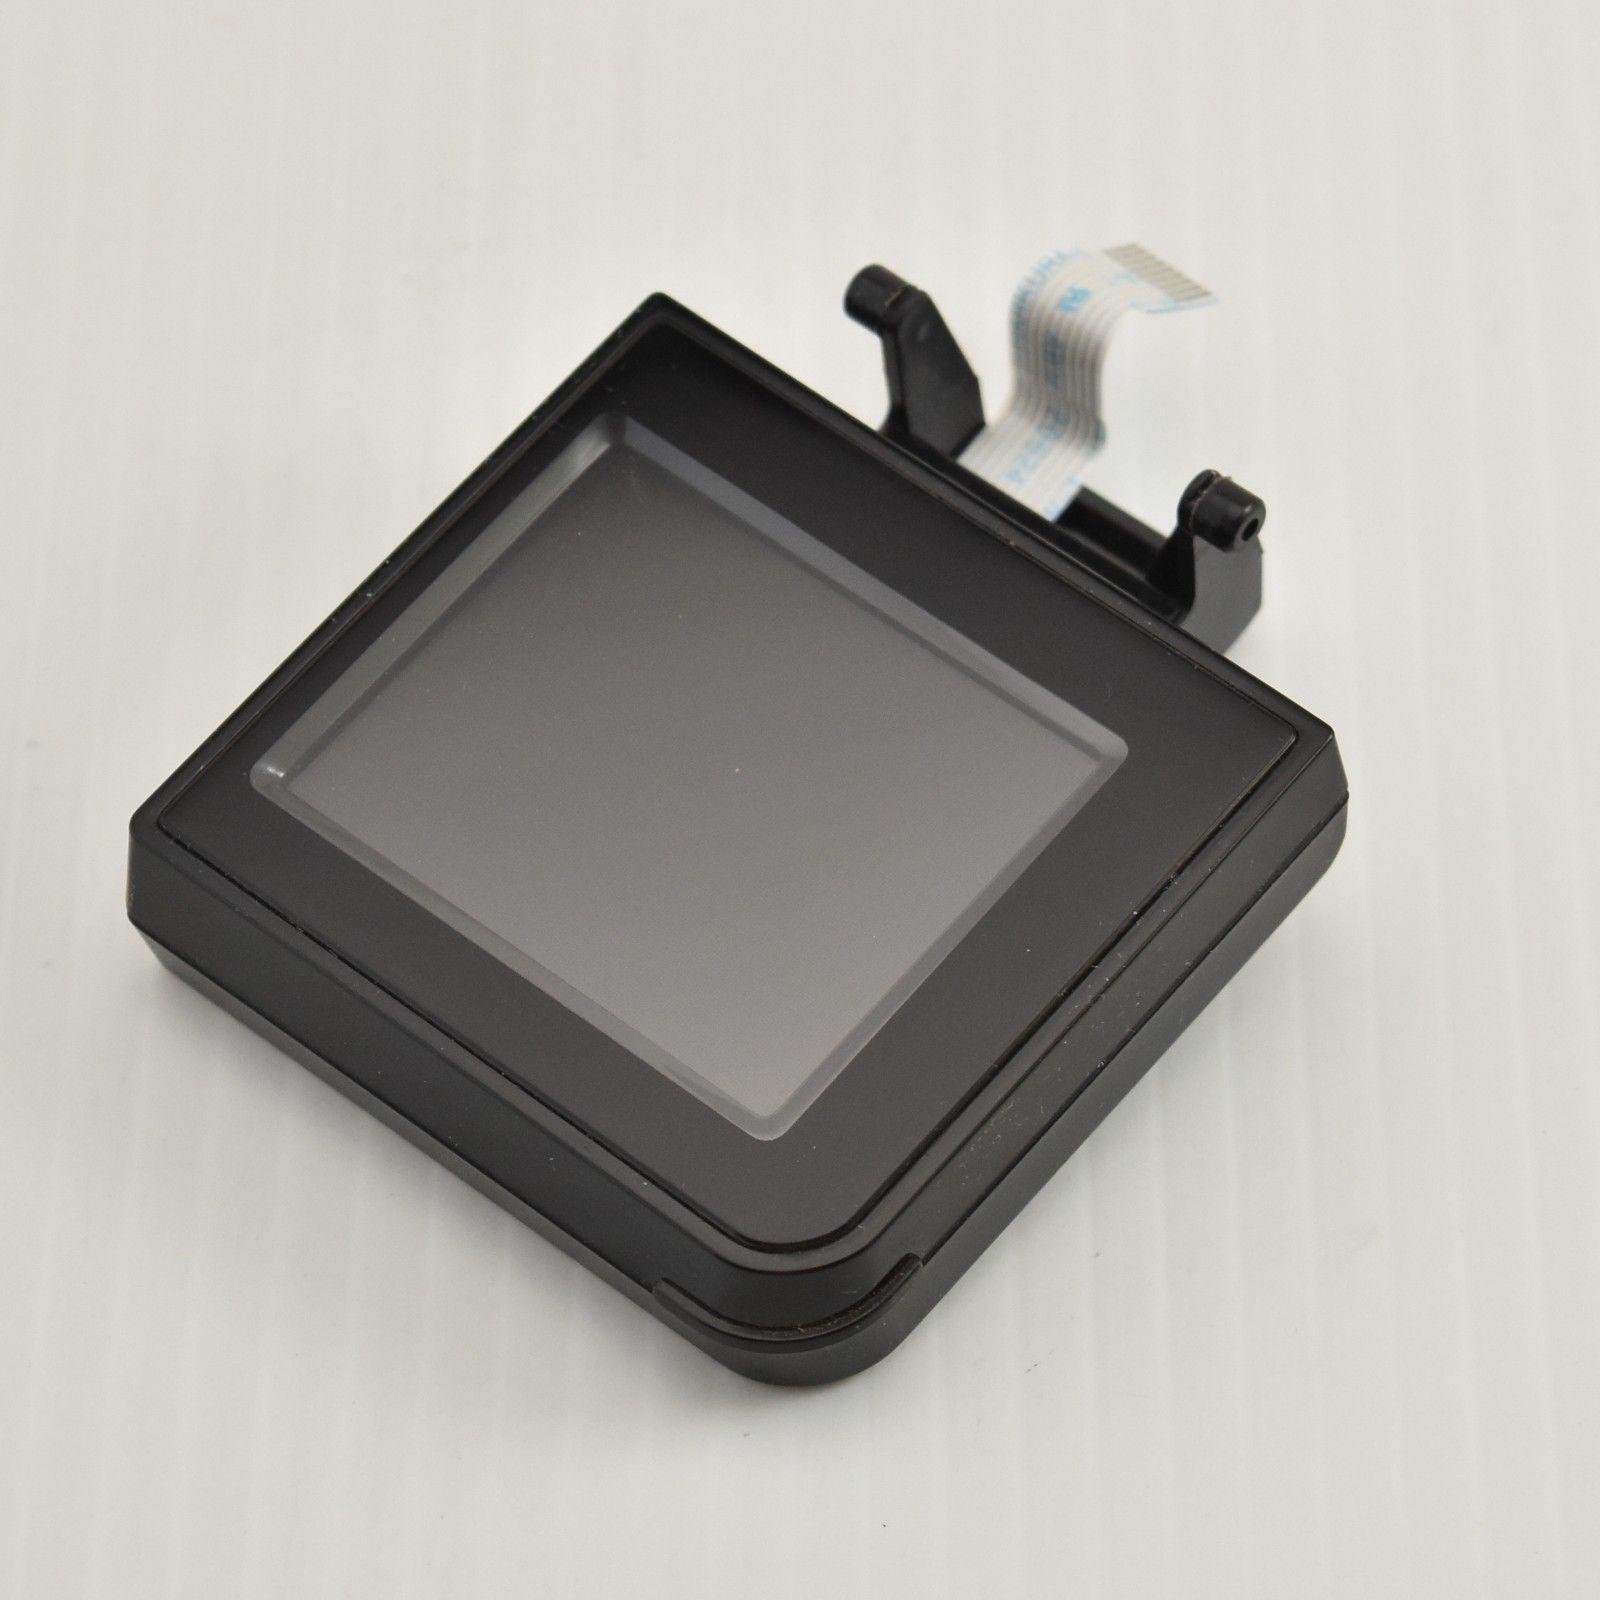 Epson Stylus Printer NX510 LCD Display and 42 similar items